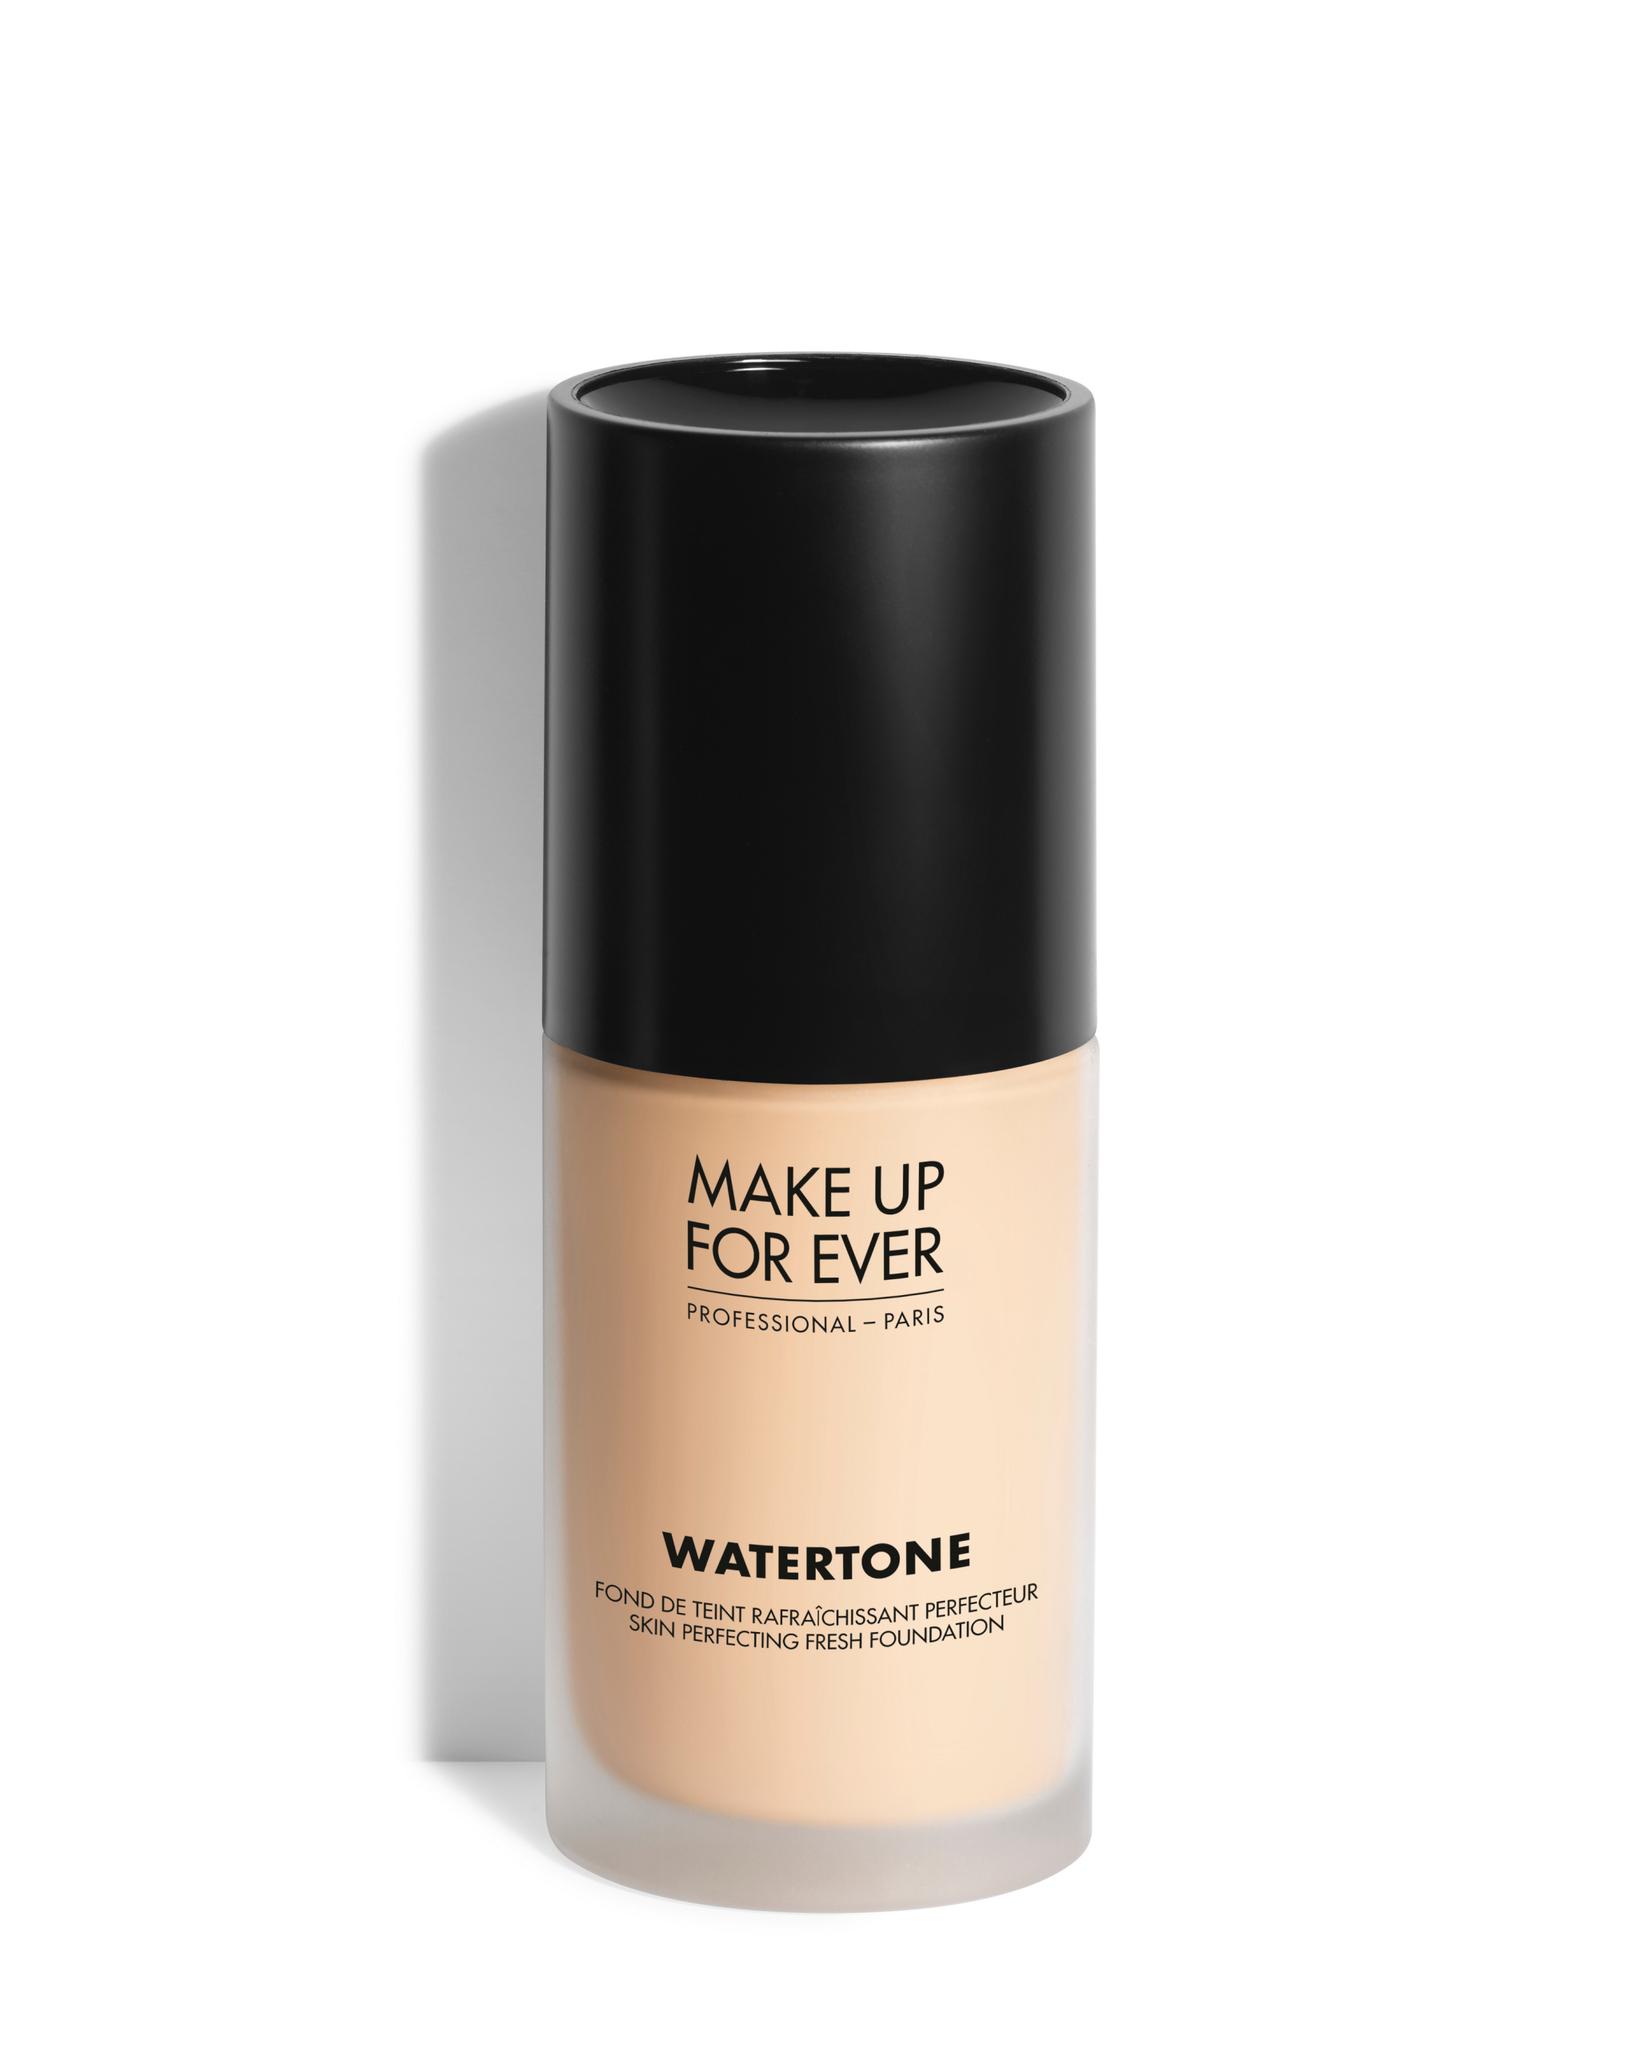 Make Up For Ever 無重淨肌粉底 $320/40ml